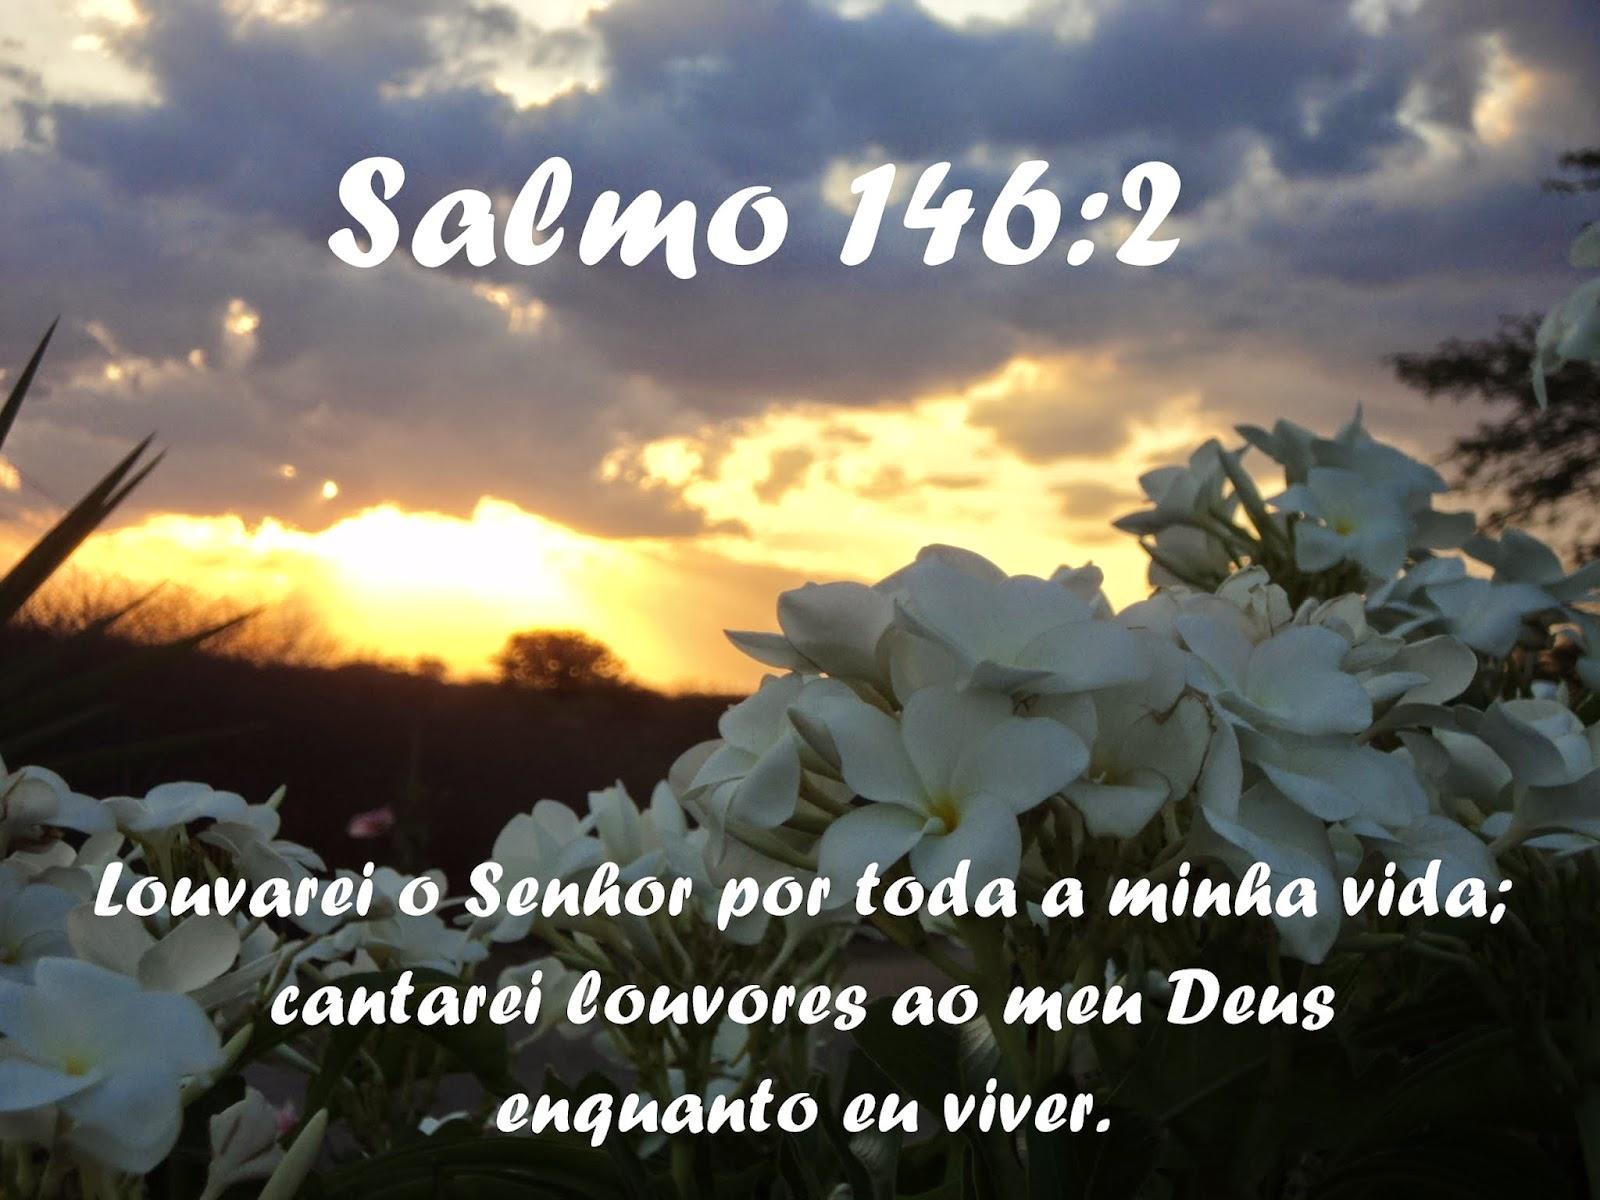 http://4.bp.blogspot.com/-v252lsjaas4/VRMiCZ67MCI/AAAAAAAAAN0/EWMxFXJwvzc/s1600/Salmo%2B146%2B2.JPG